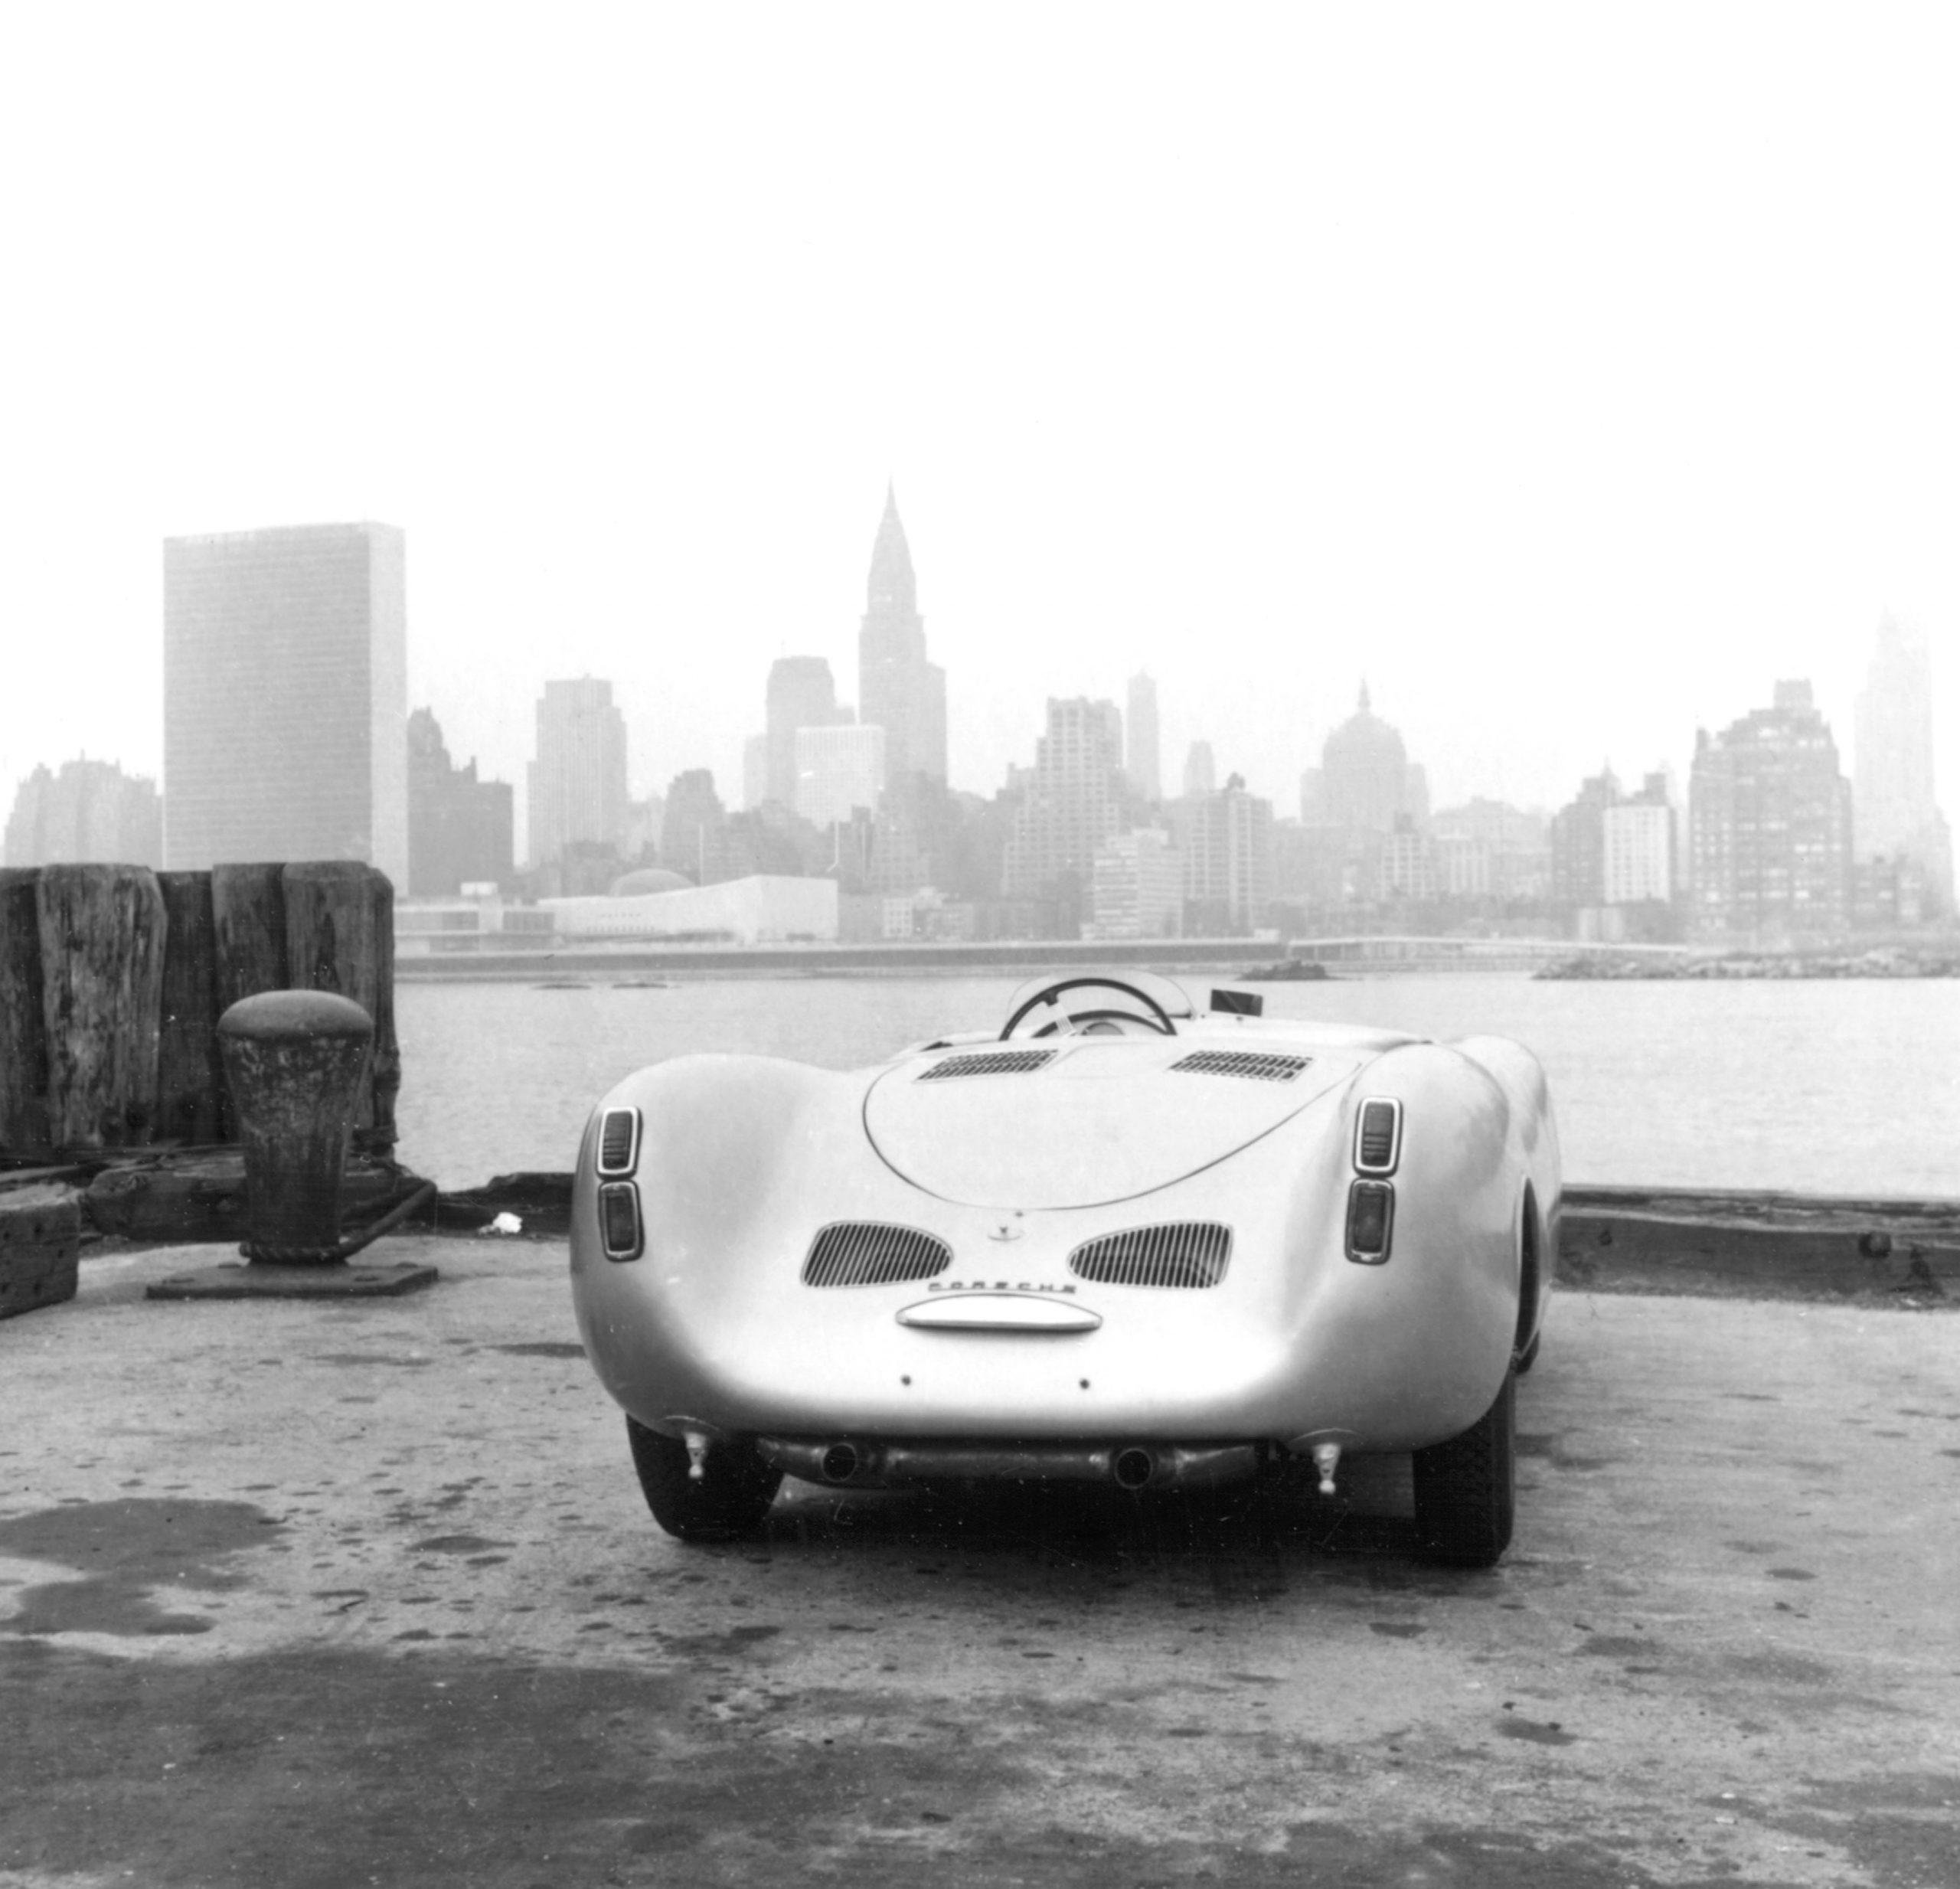 1953 carrera panamericana porsche 550 spyder new york city